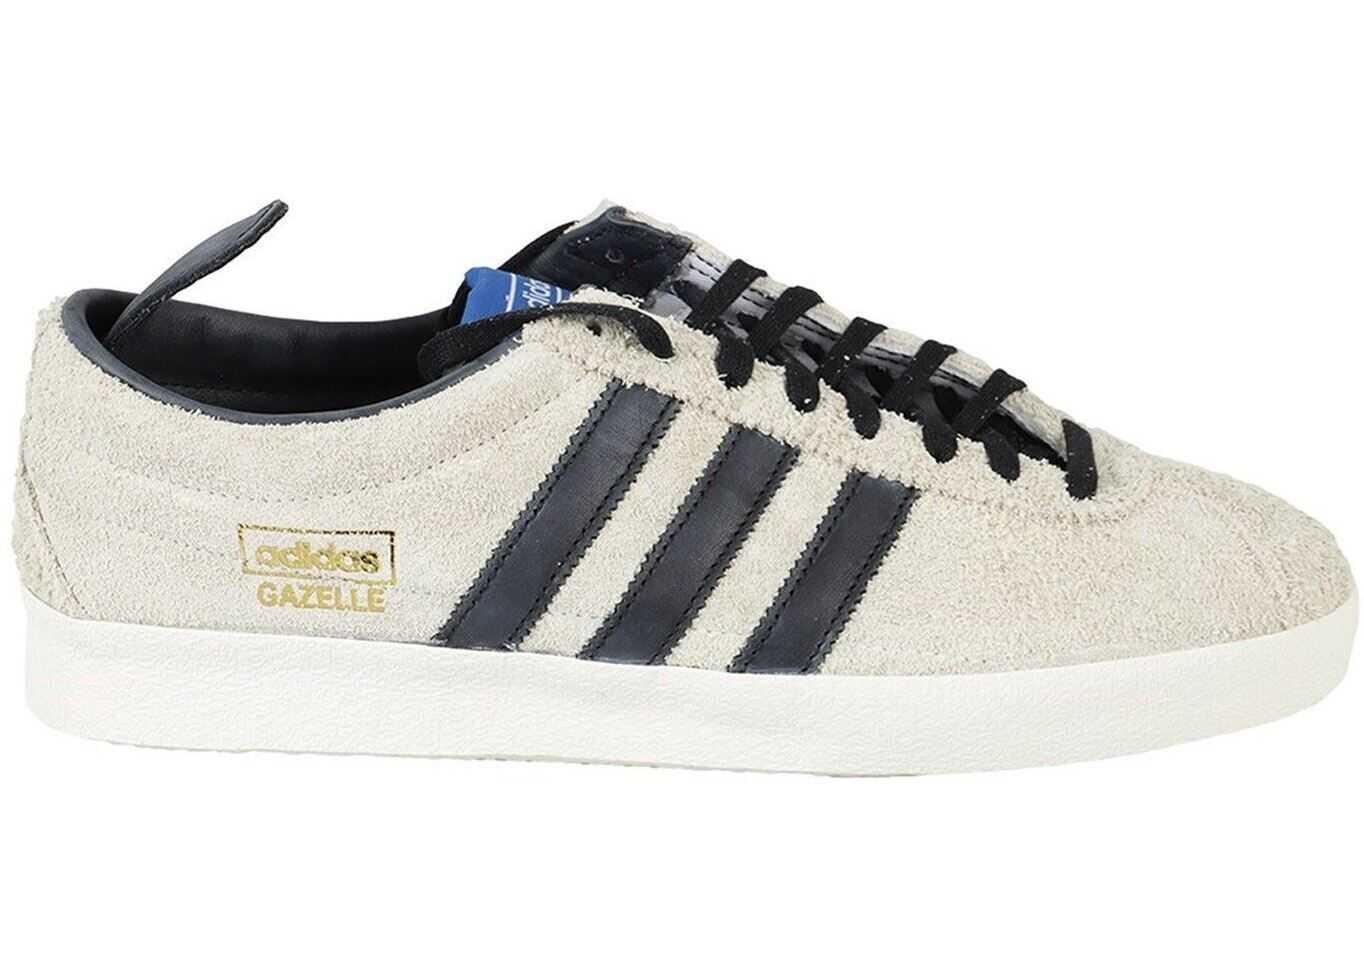 adidas Originals Gazelle Vintage Sneakers In White FX5488 White imagine b-mall.ro